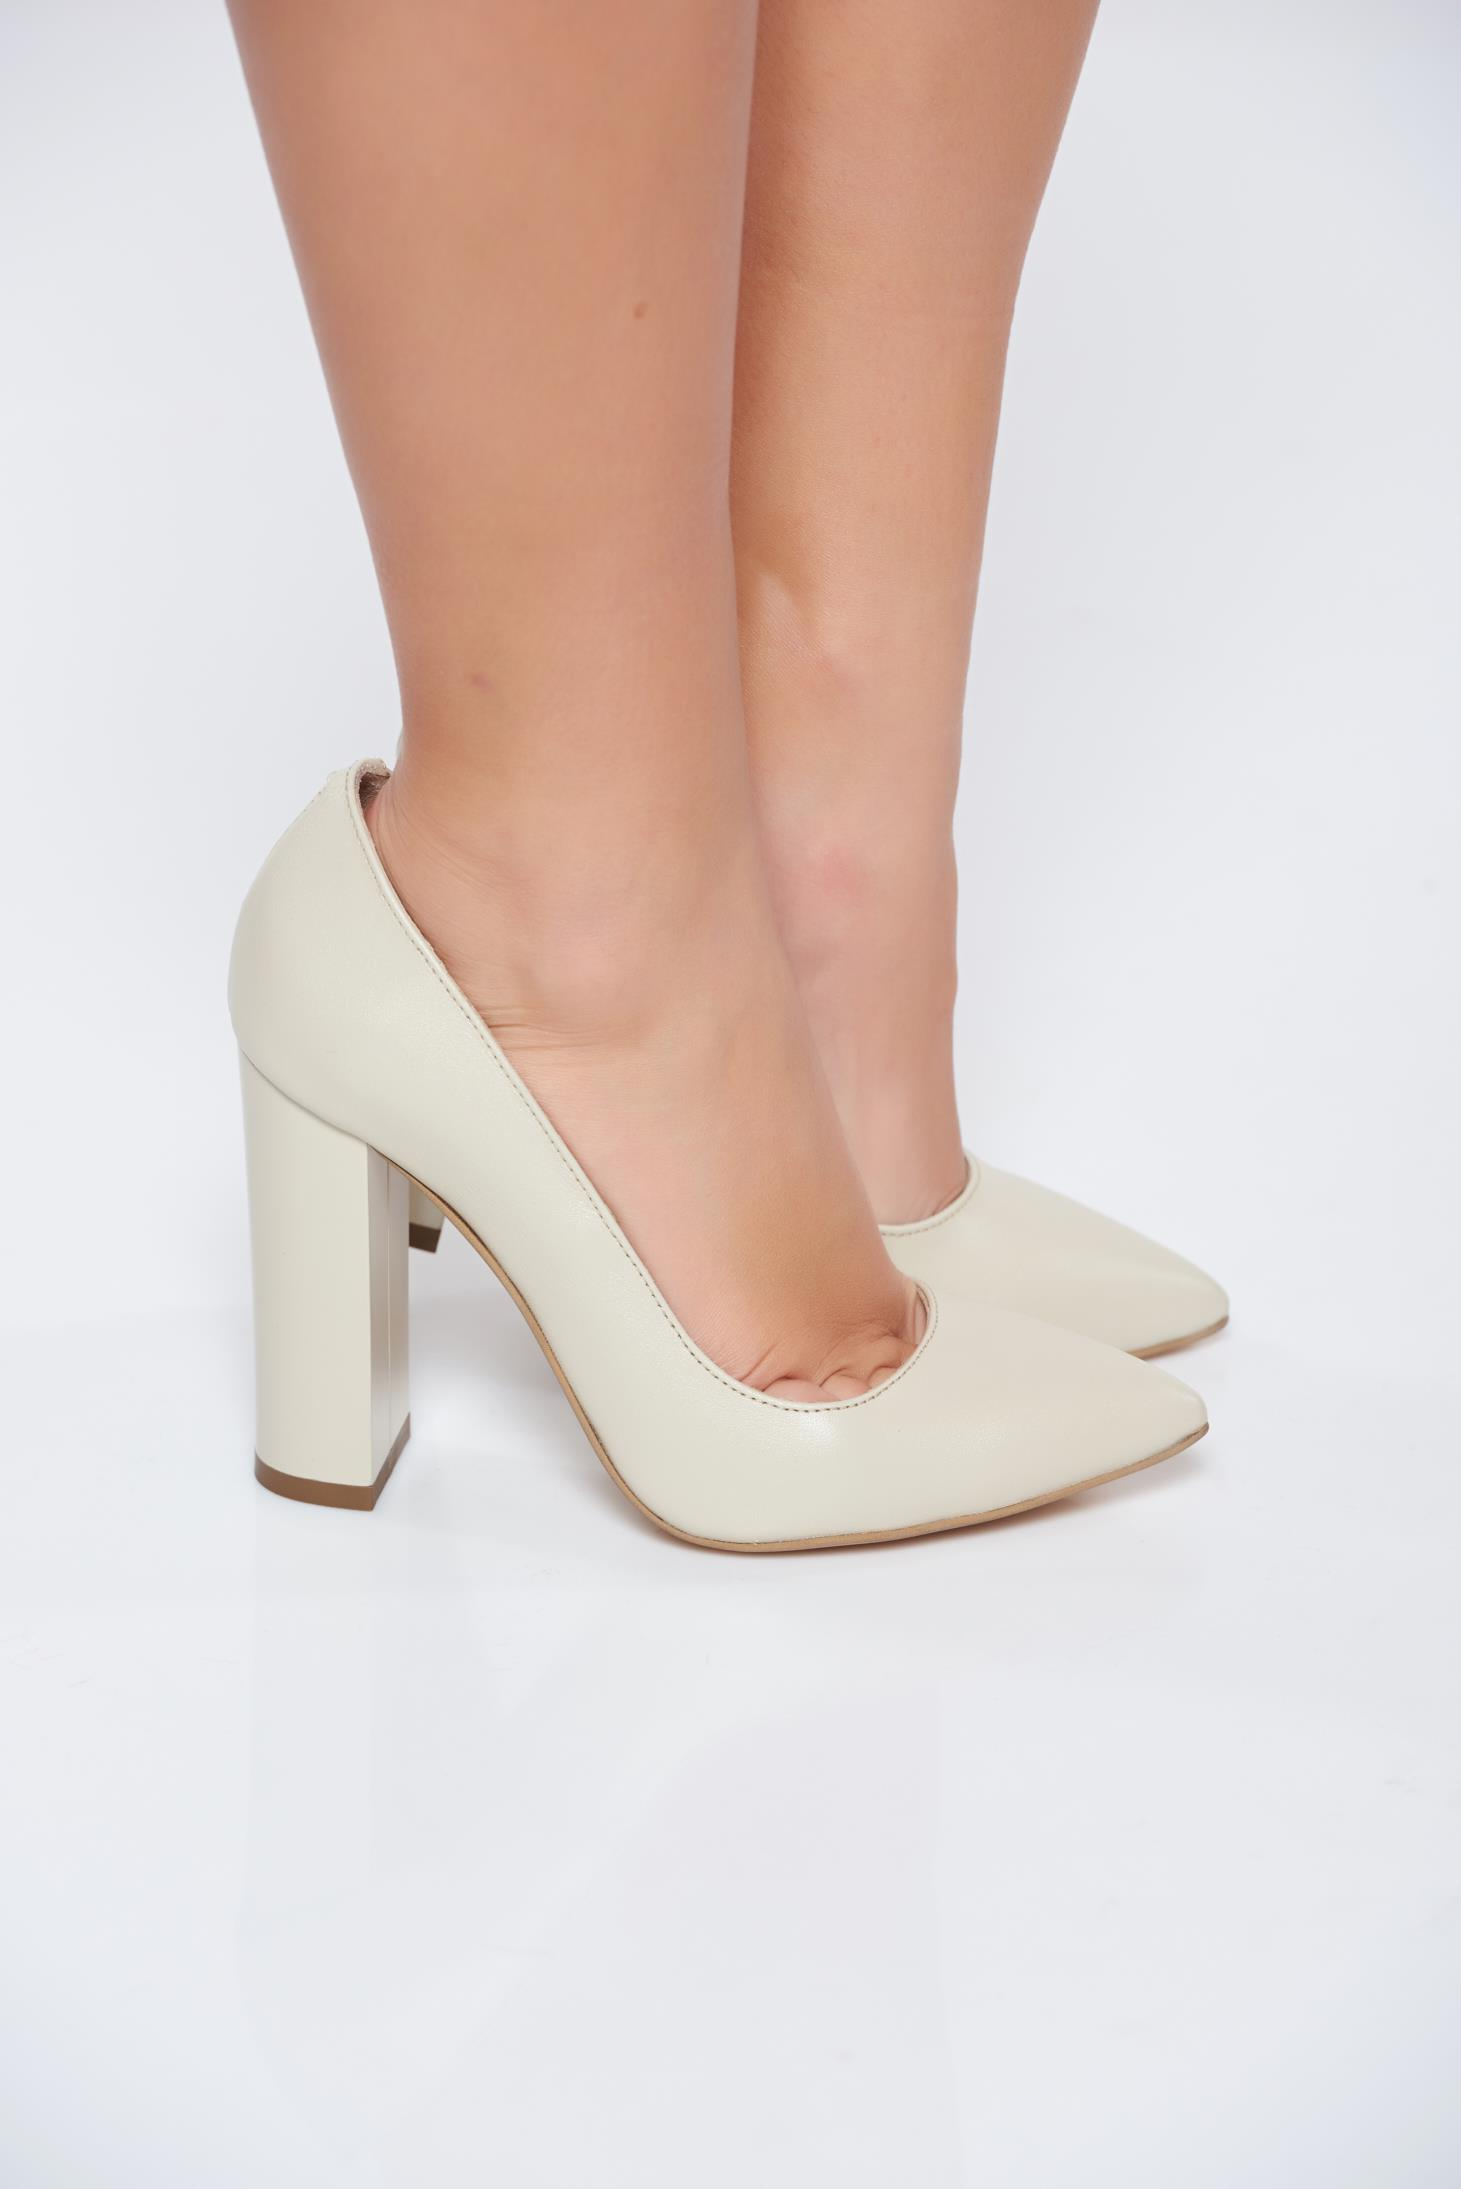 Cream Chunky Heels